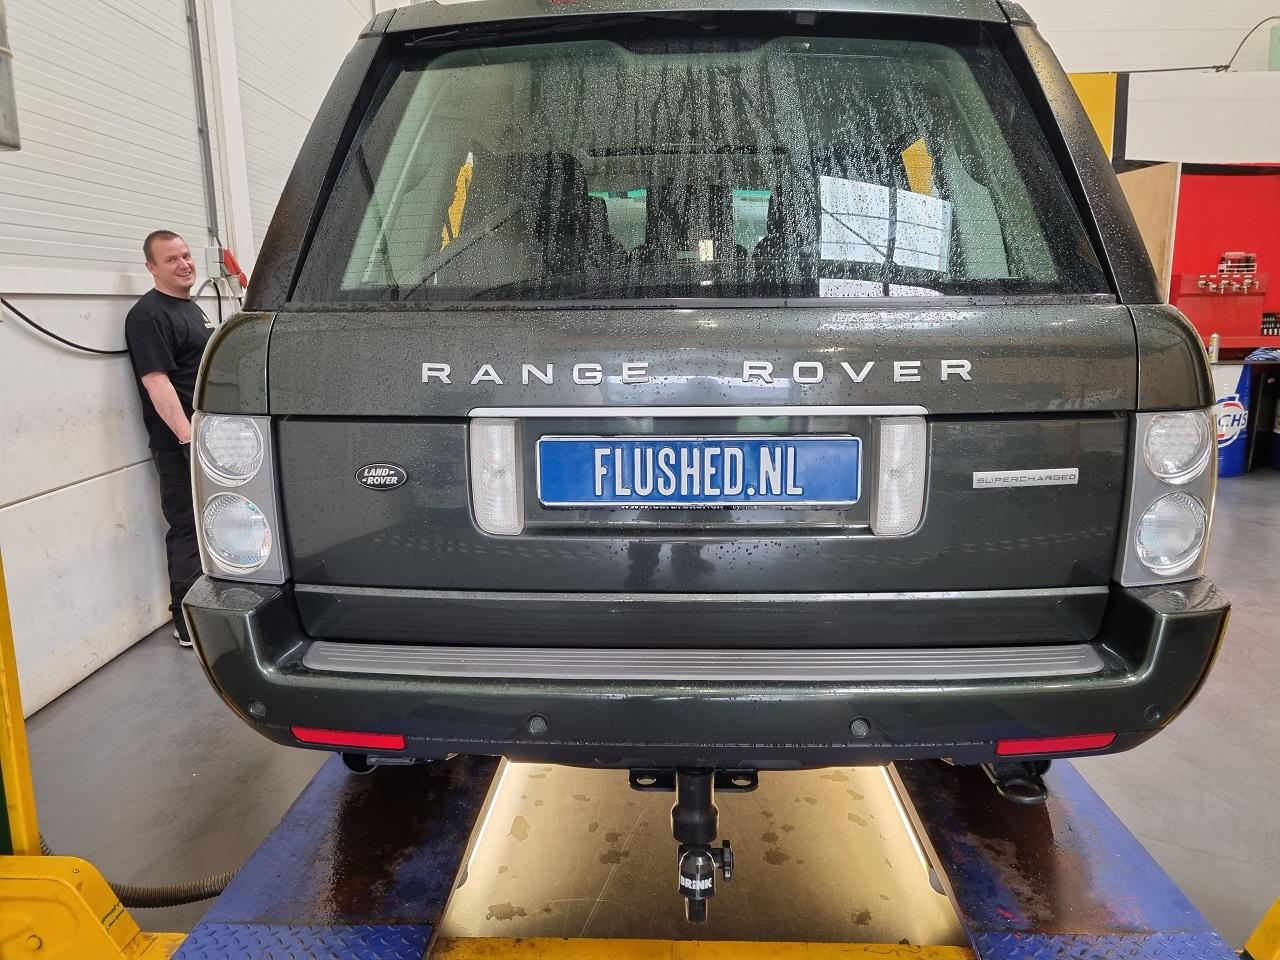 Range Rover Automaatbak Spoelen